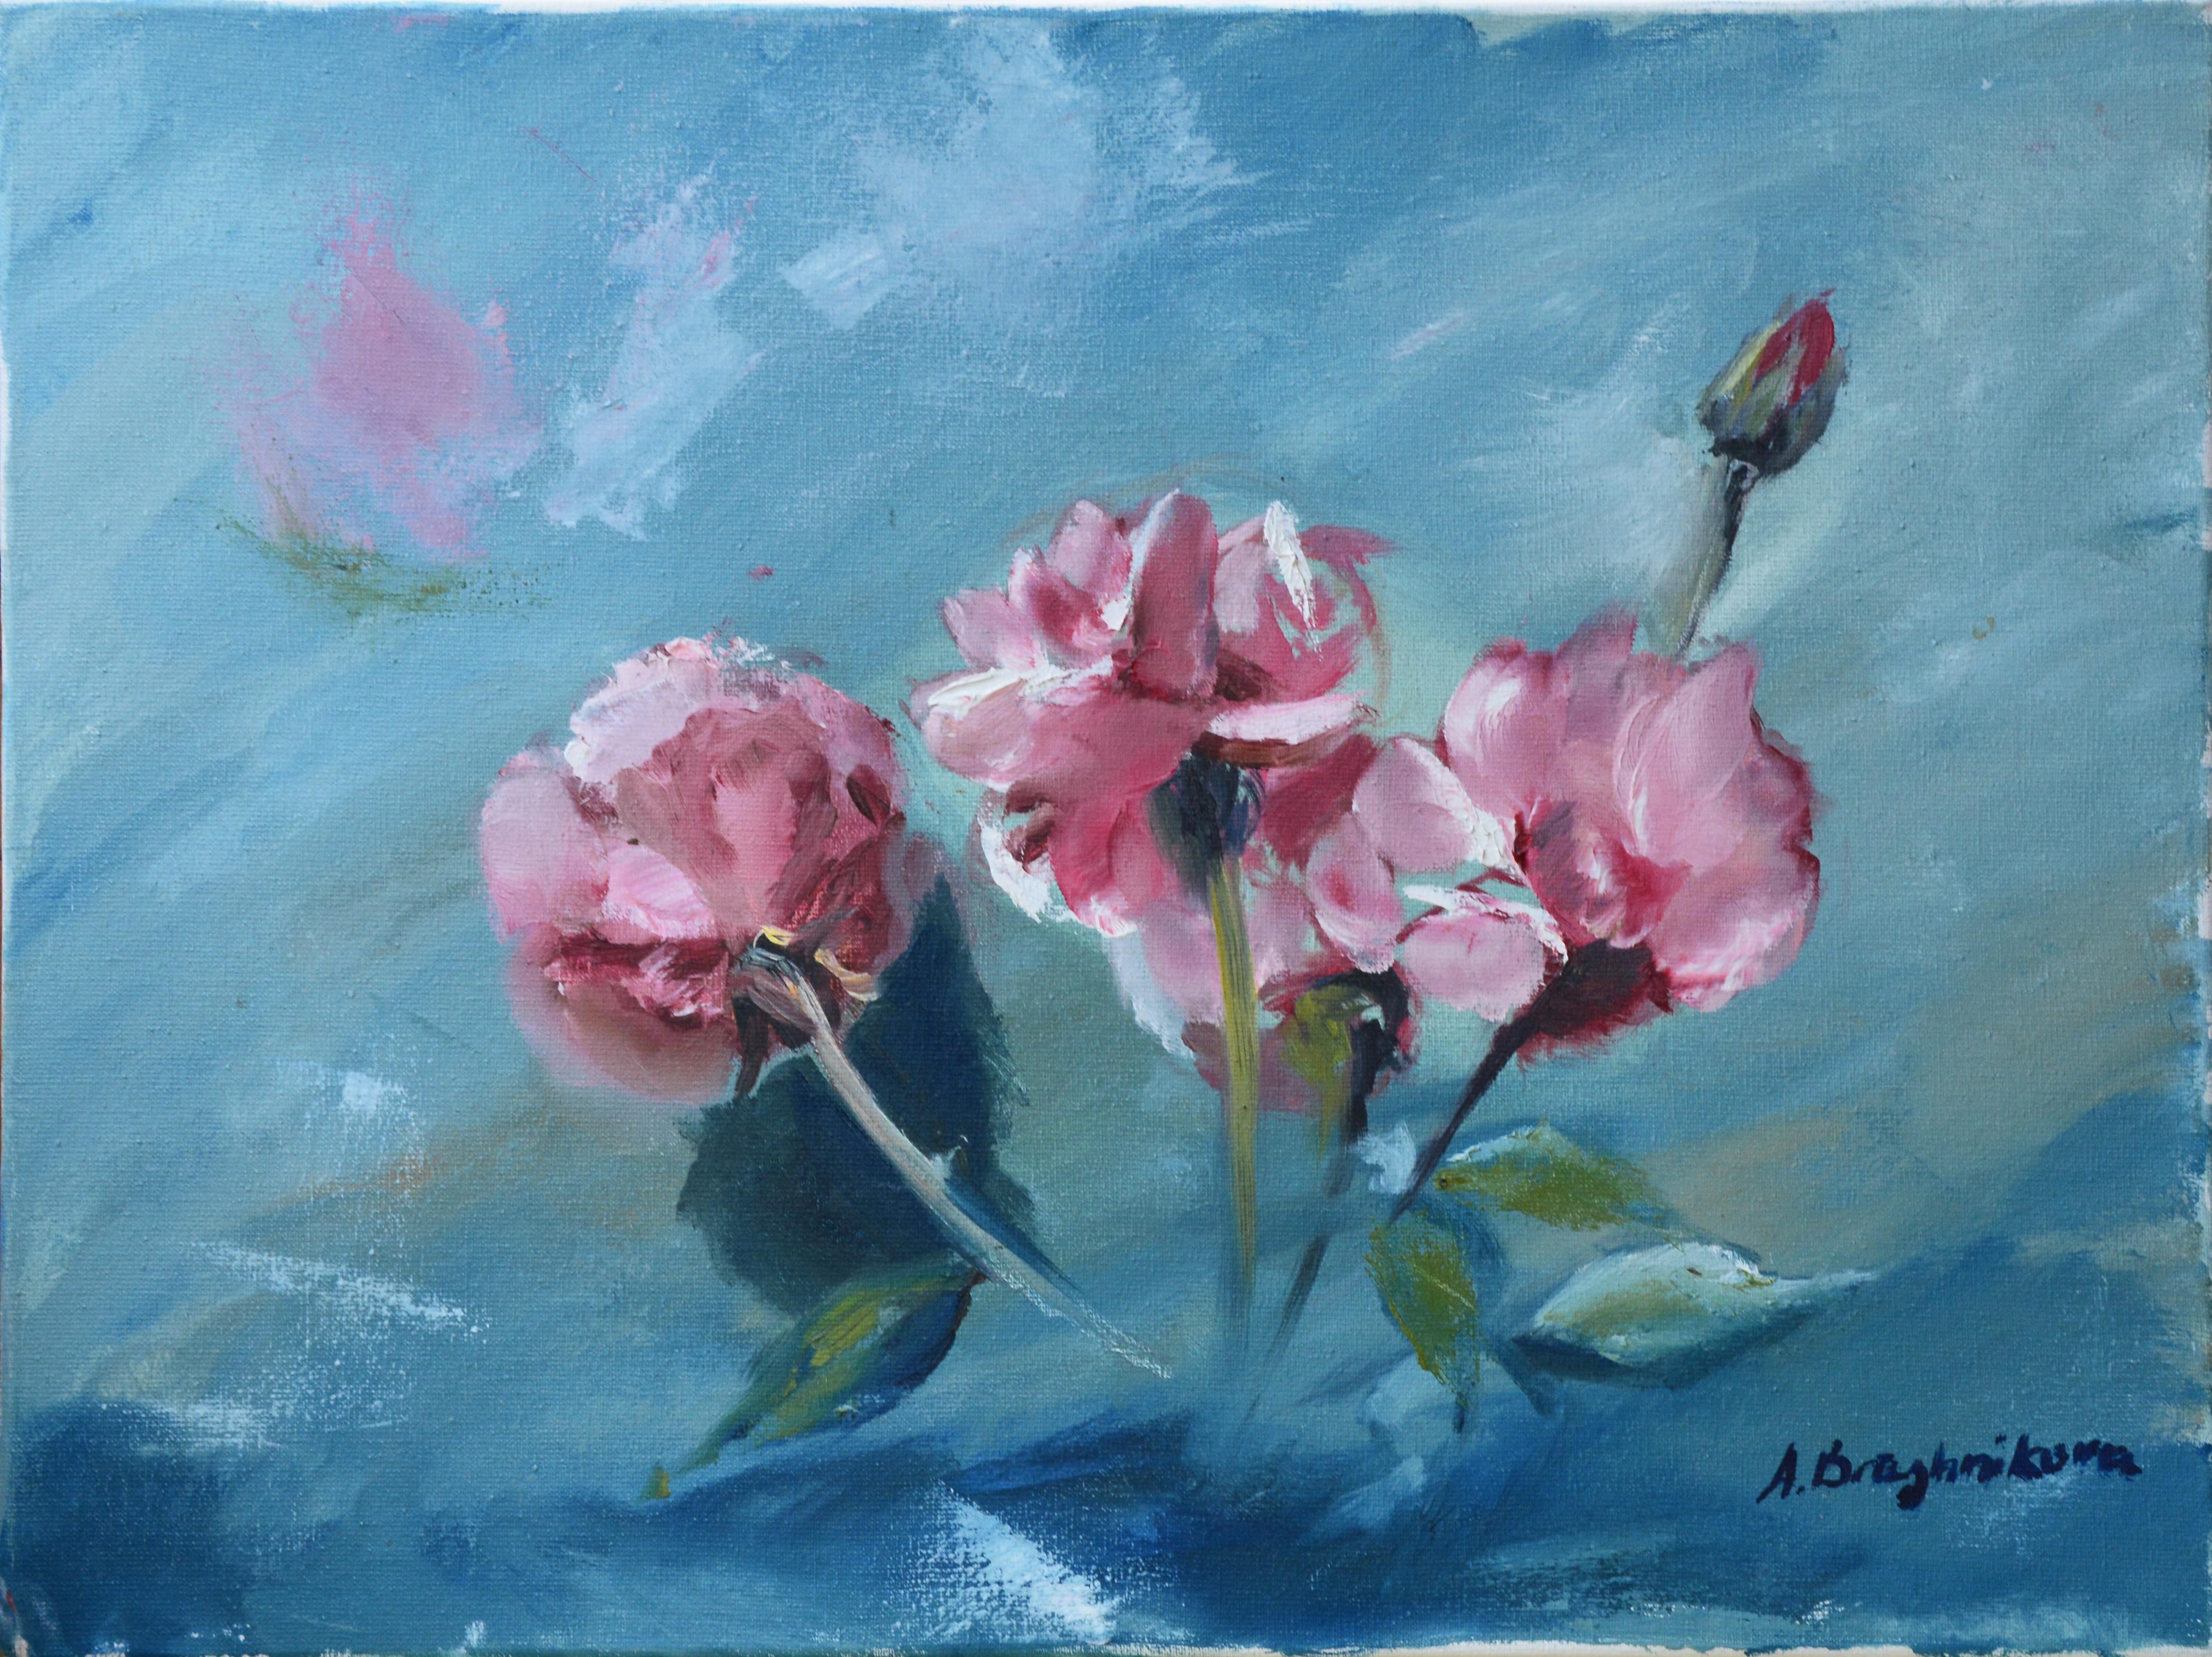 Roses on blue background